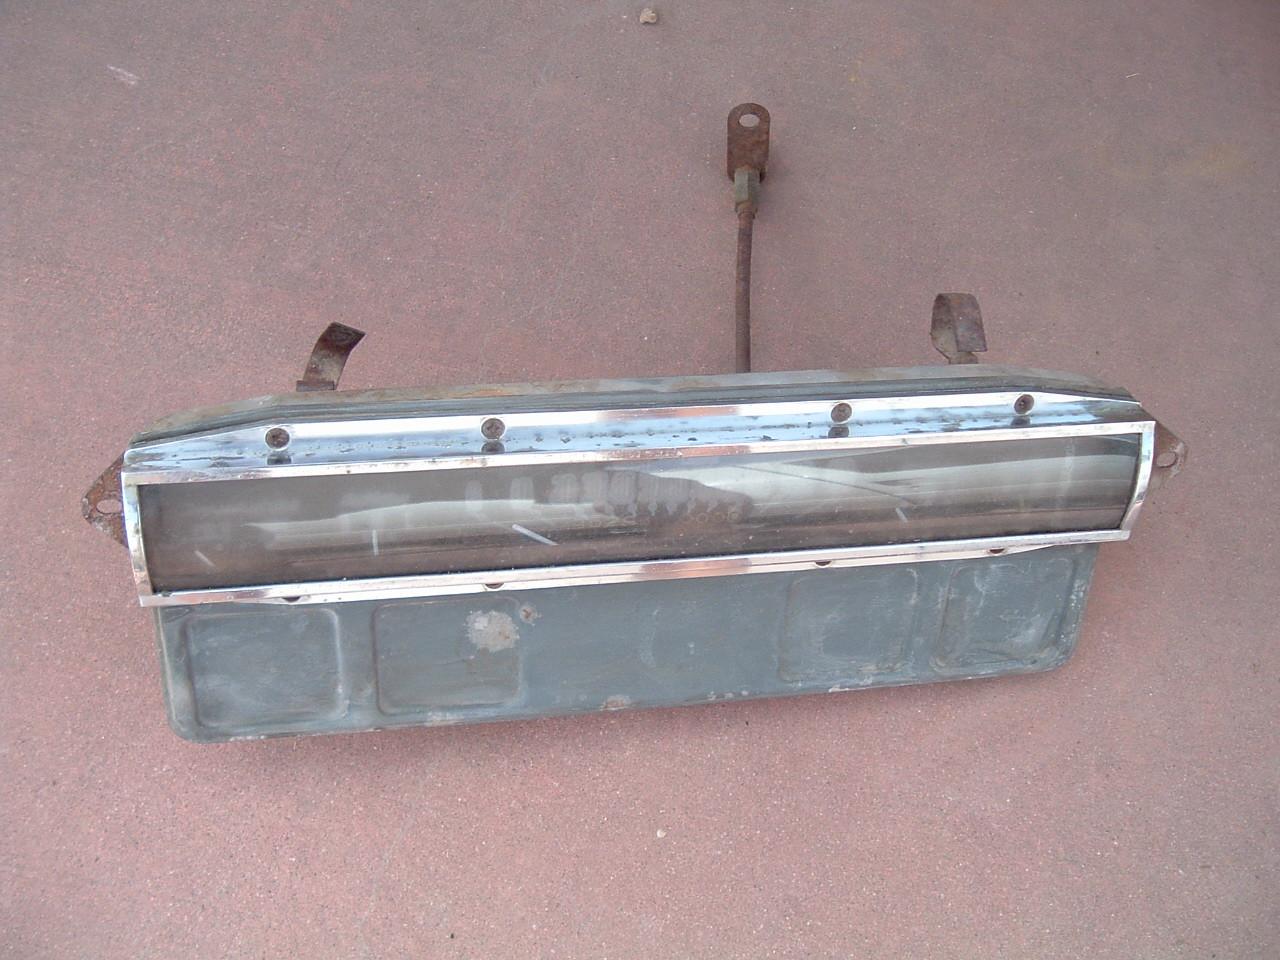 1939 cadillac speedometer and gauge cluster original used (1) (z 39cadcluster)